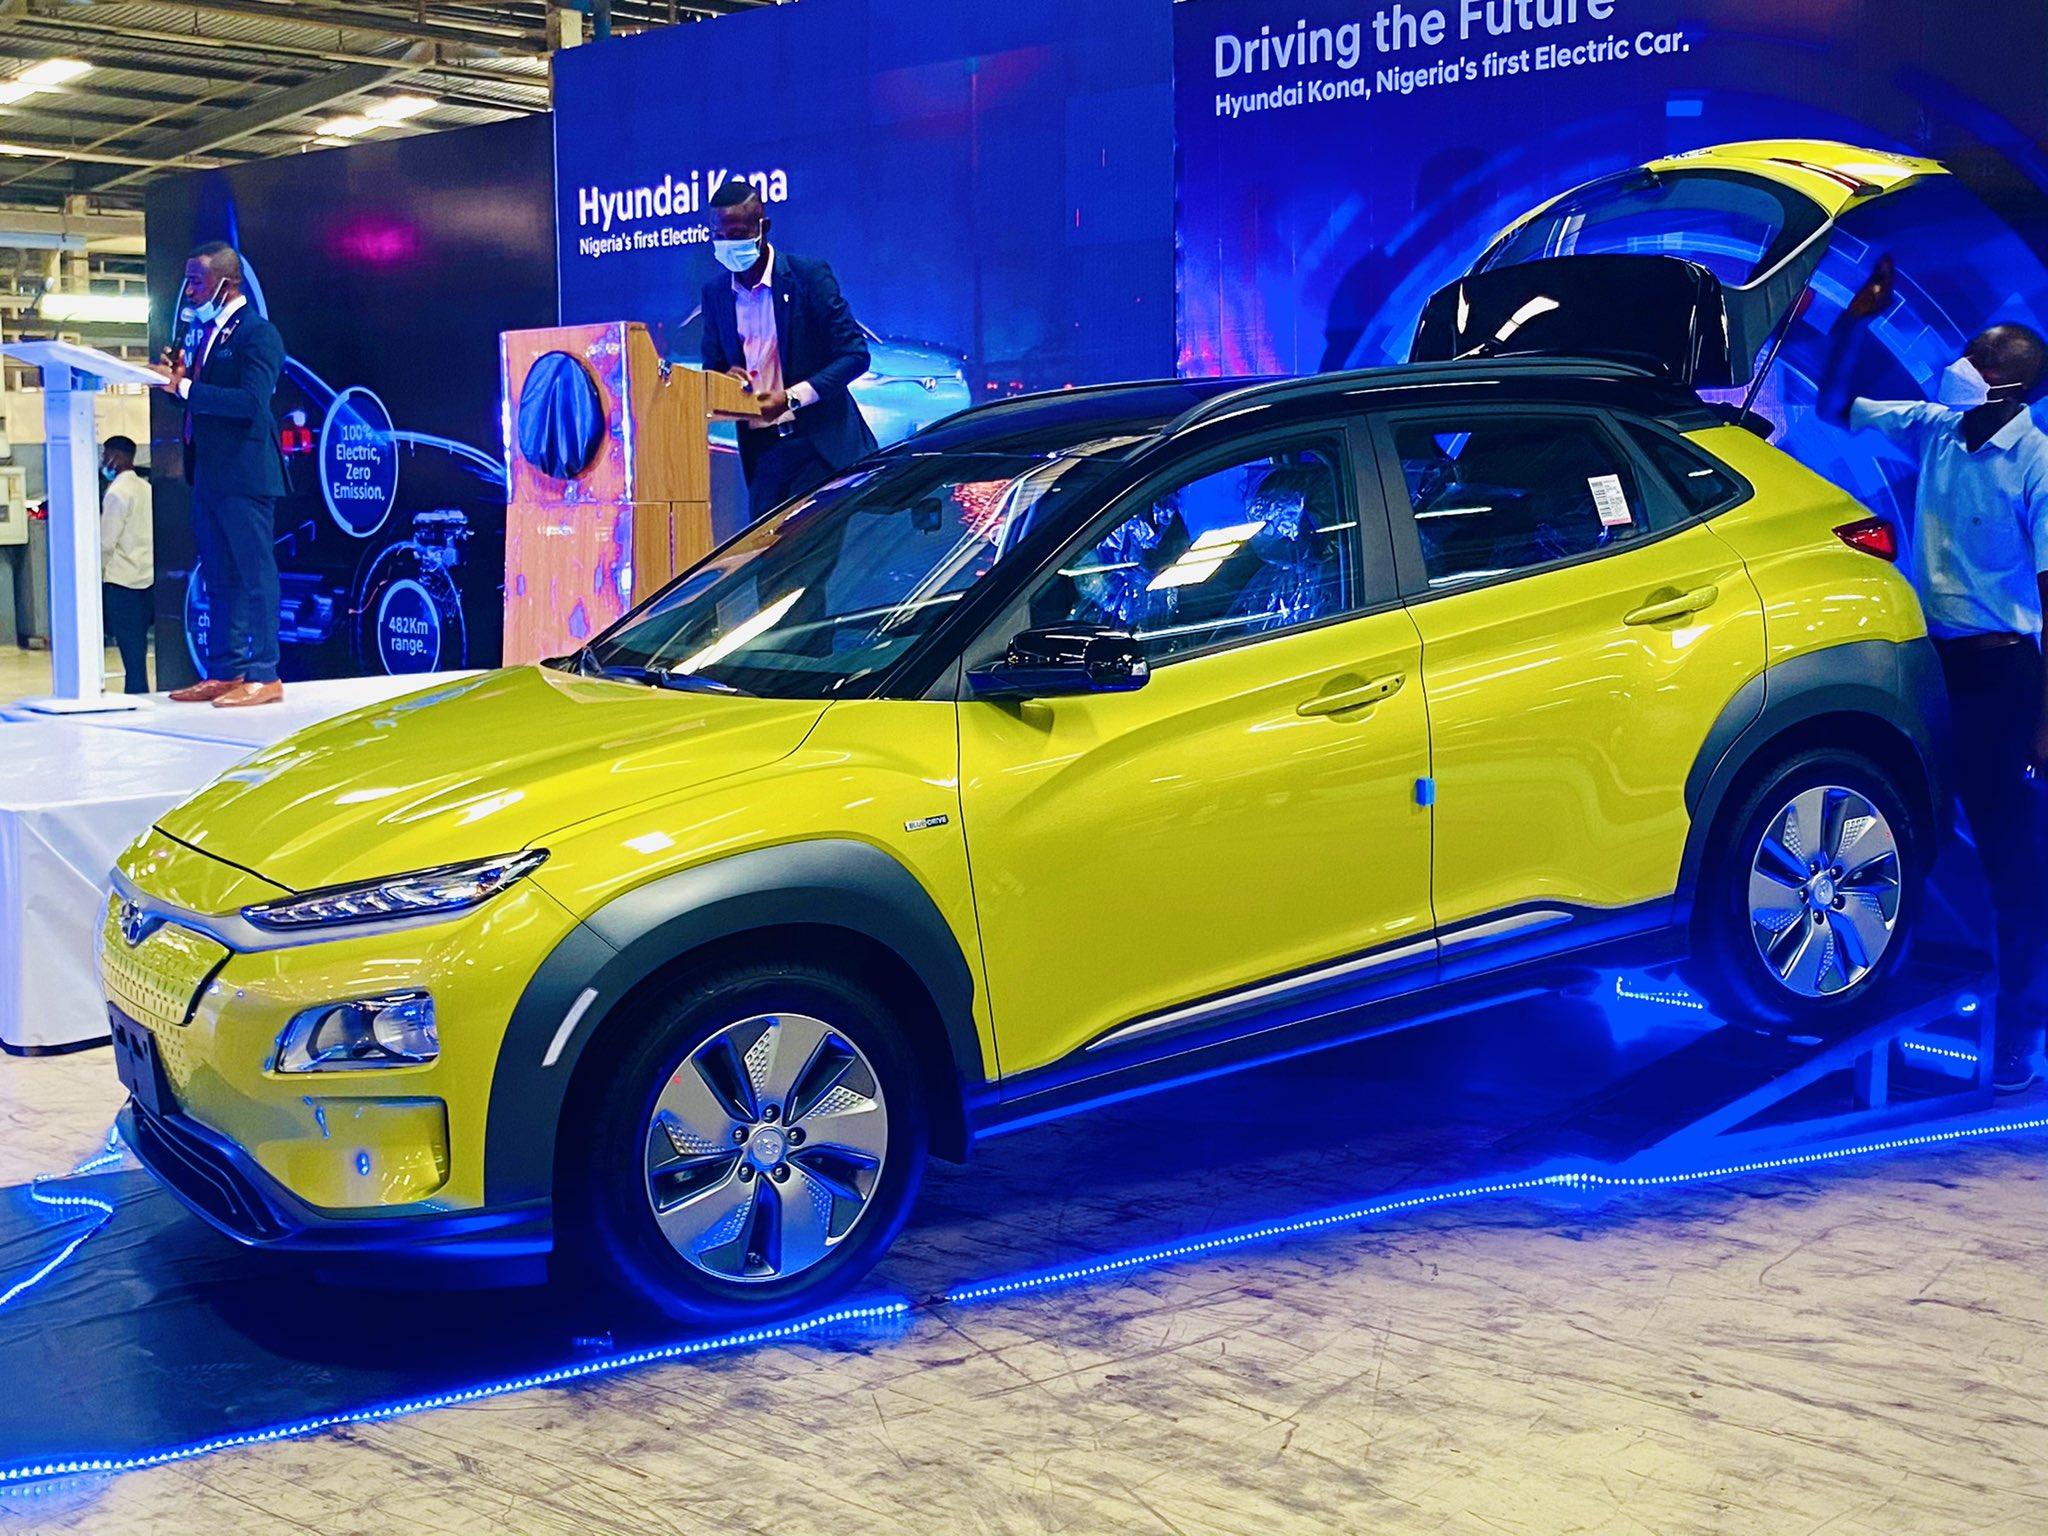 Hyundai motors unveils first electric car in Nigeria